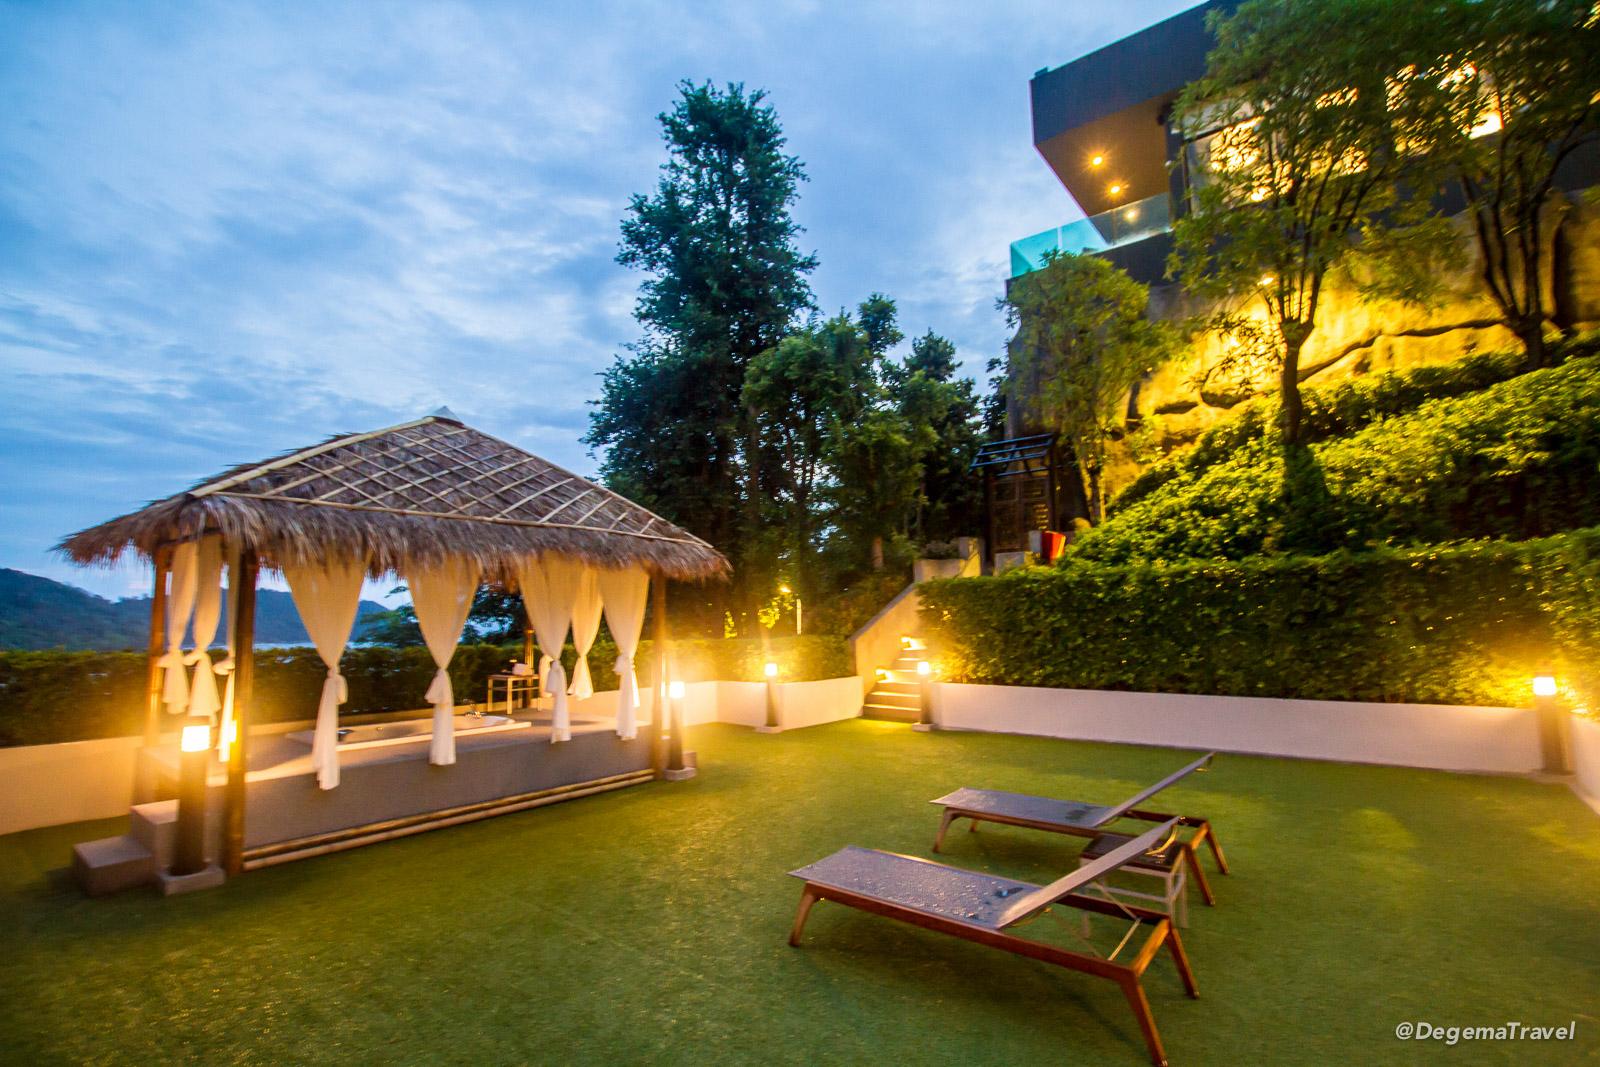 Outdoor Jacuzzi at Nook-Dee Boutique Resort in Phuket, Thailand